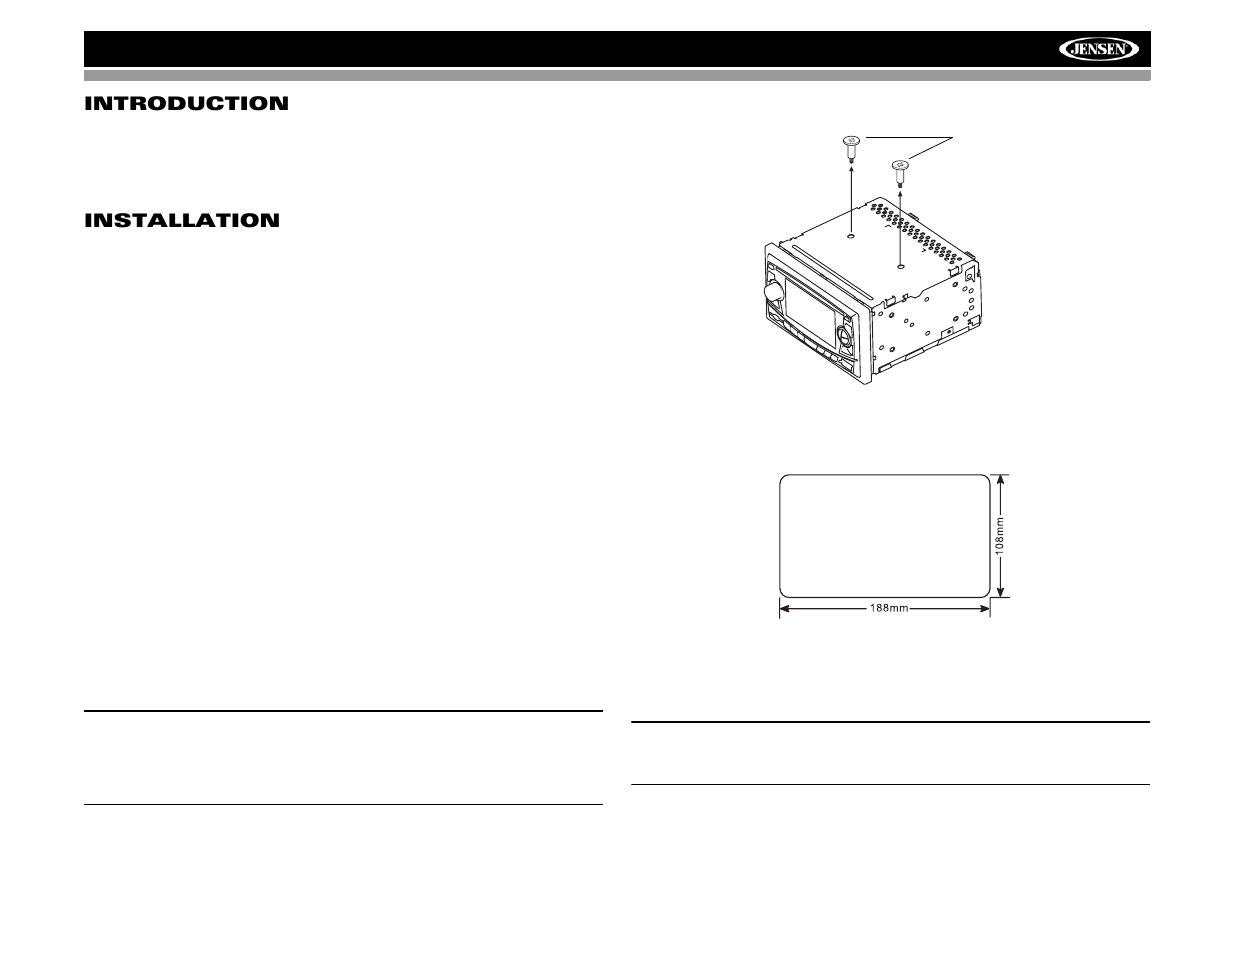 Audiovox Jensen Vm8022 User Manual Page 5 24 Car Cd Player Wiring Diagram